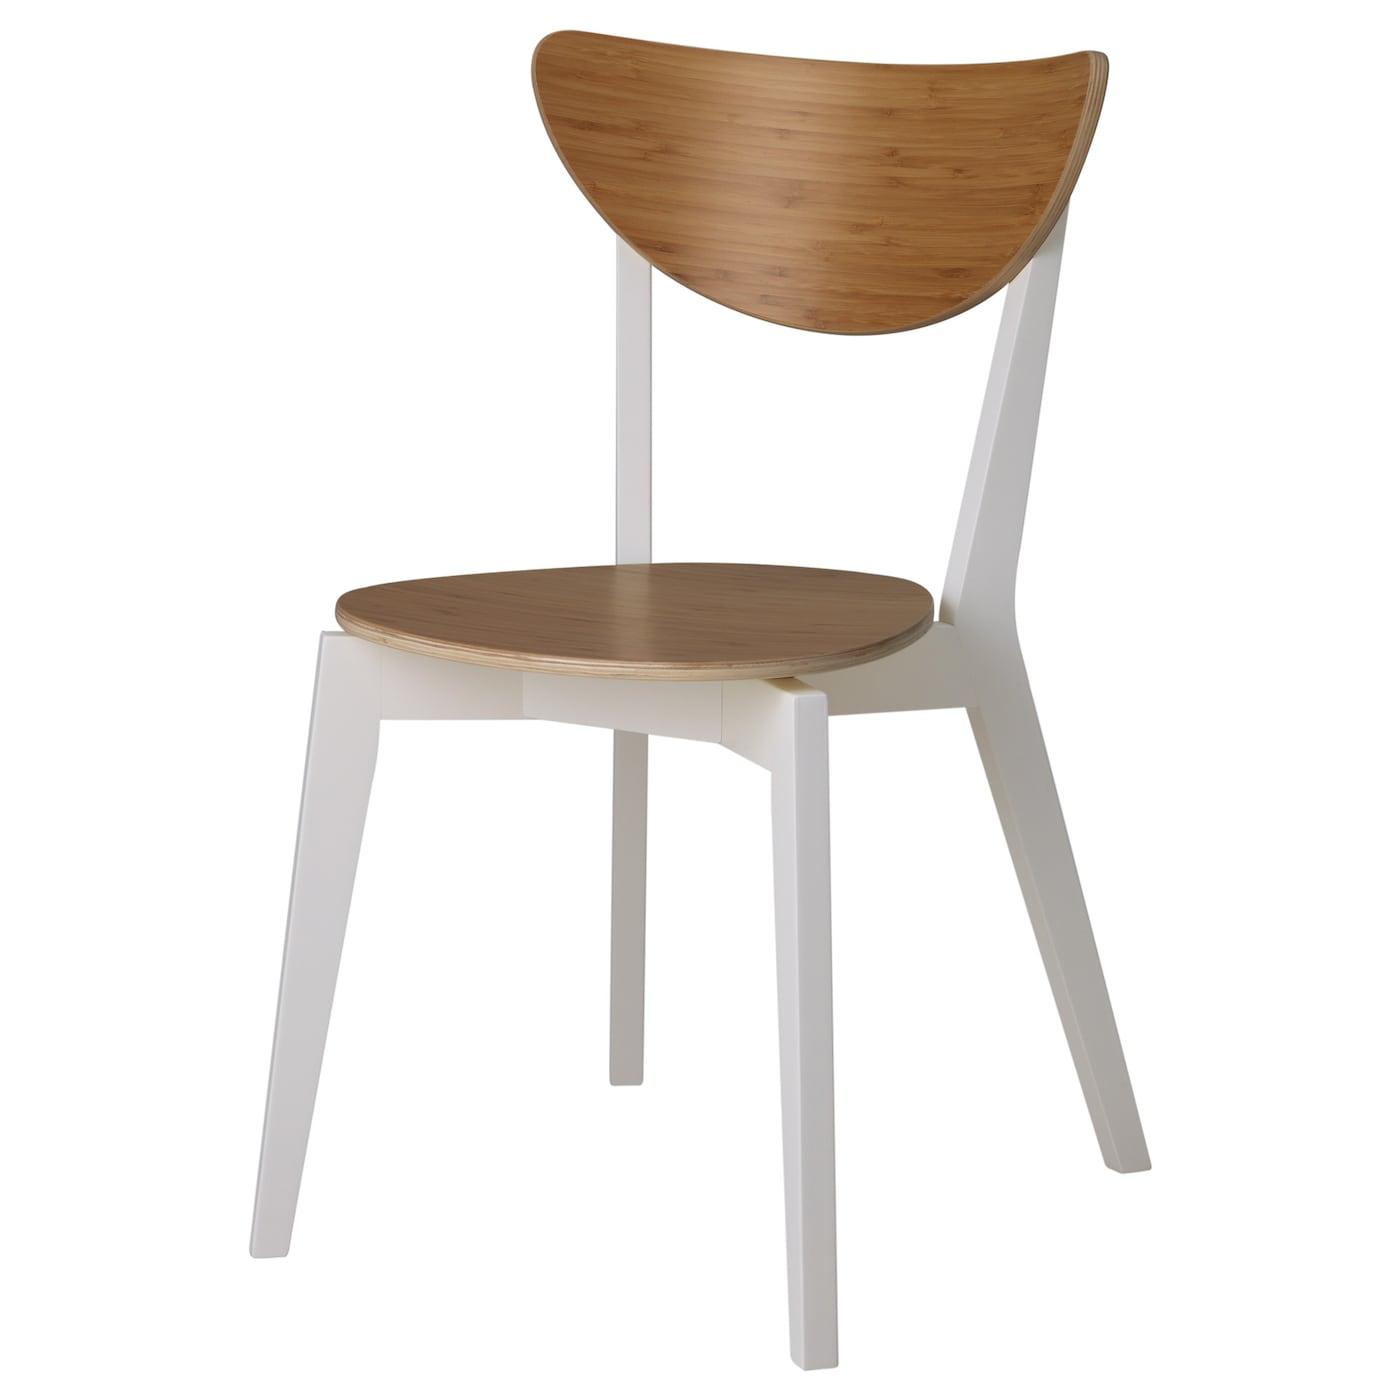 Nordmyra chair bamboo white ikea for Ikea white chair